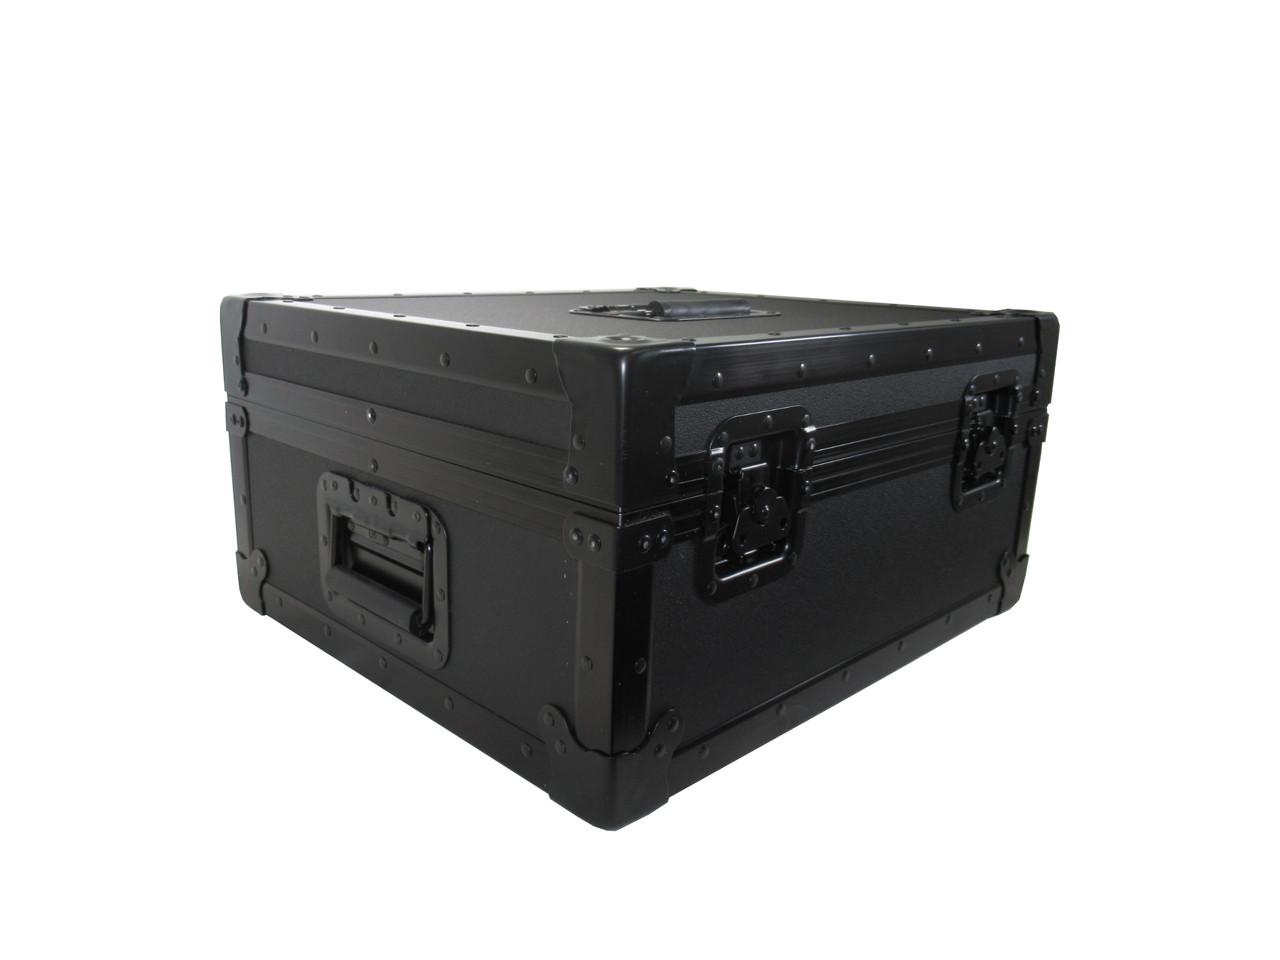 TLS Canon K35 (Horizontal Orientation) Shipping Case